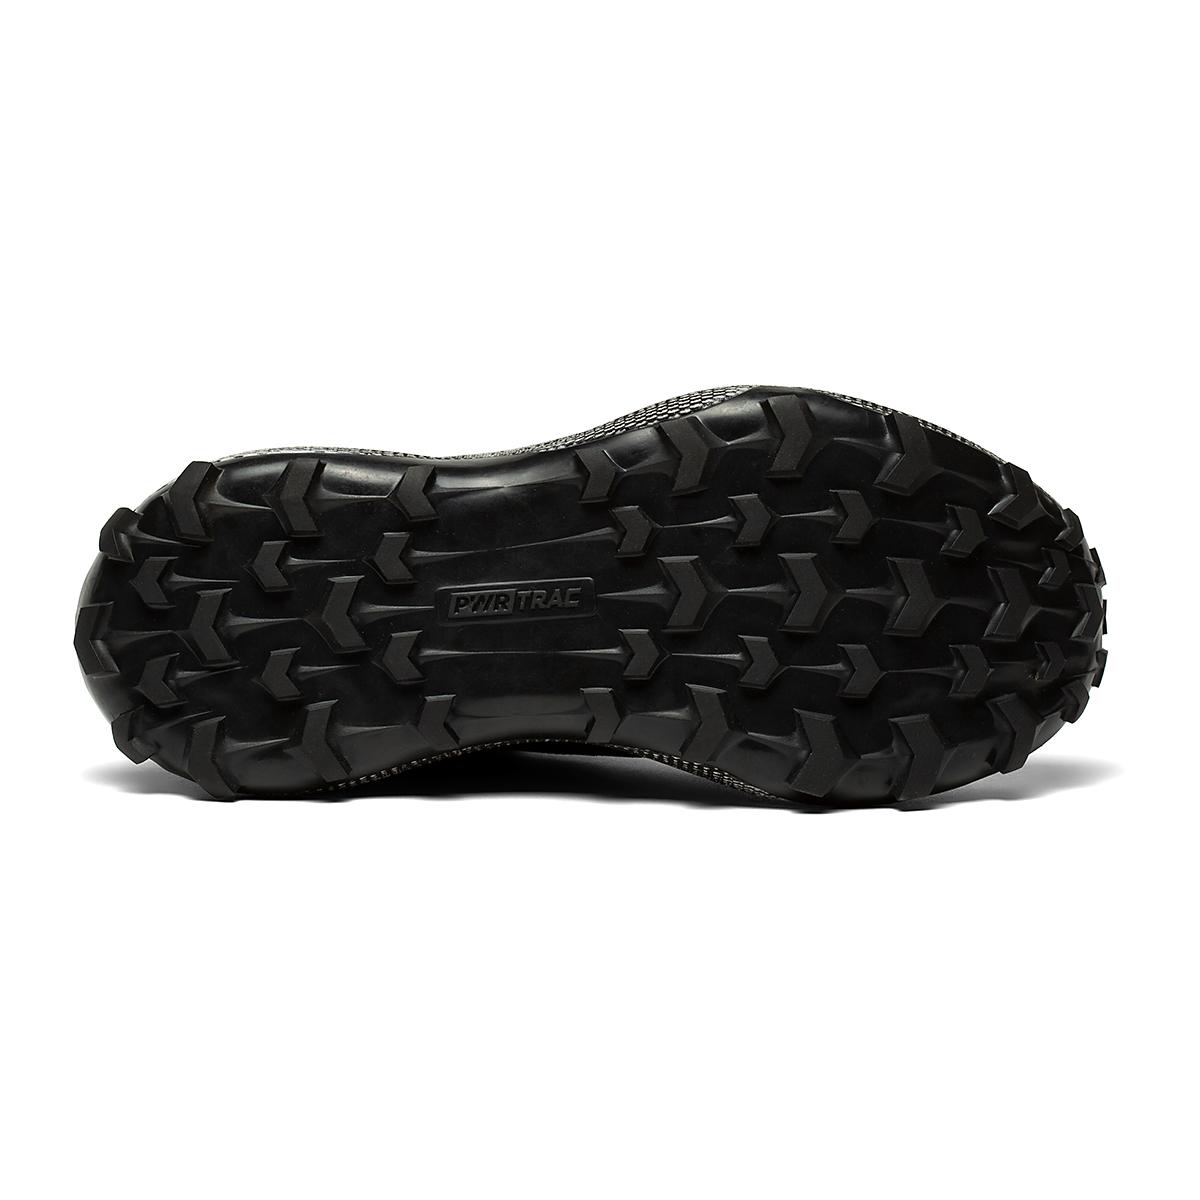 Women's Saucony Endorphin Trail Running Shoe - Color: Black/Gravel - Size: 5.5 - Width: Regular, Black/Gravel, large, image 4